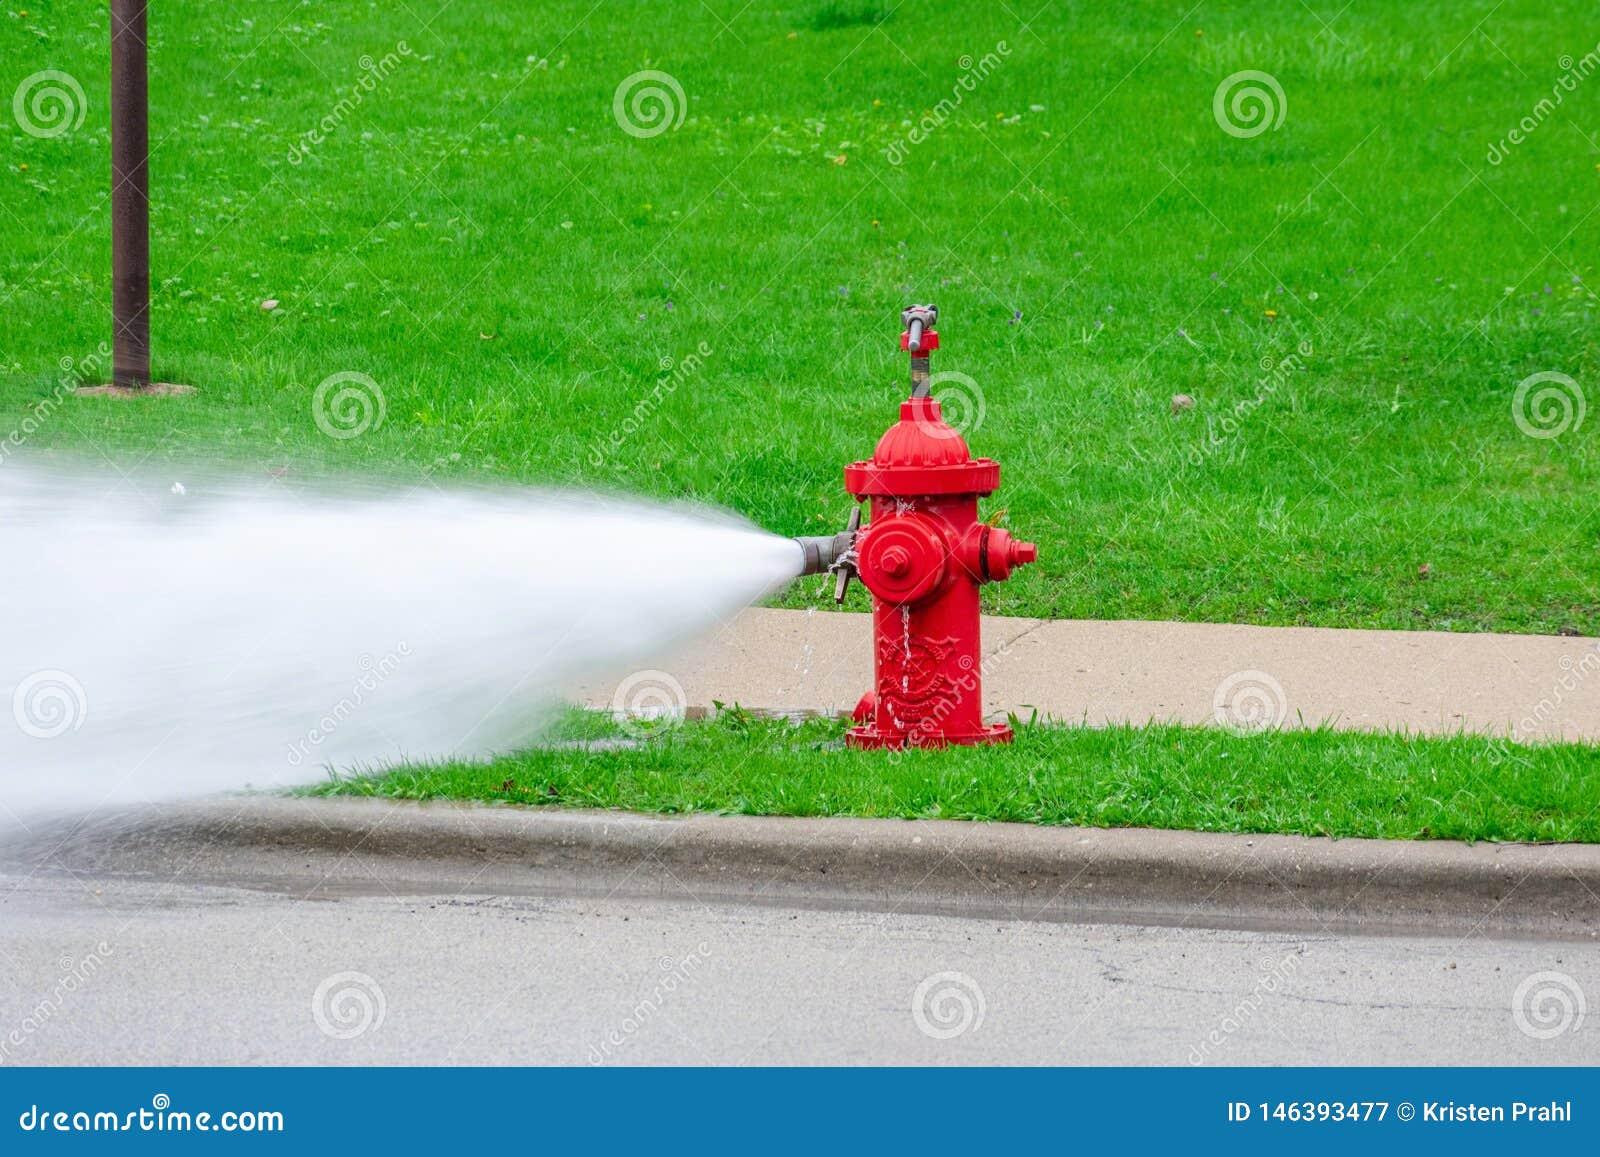 Rode brandkraan die worden gespoeld